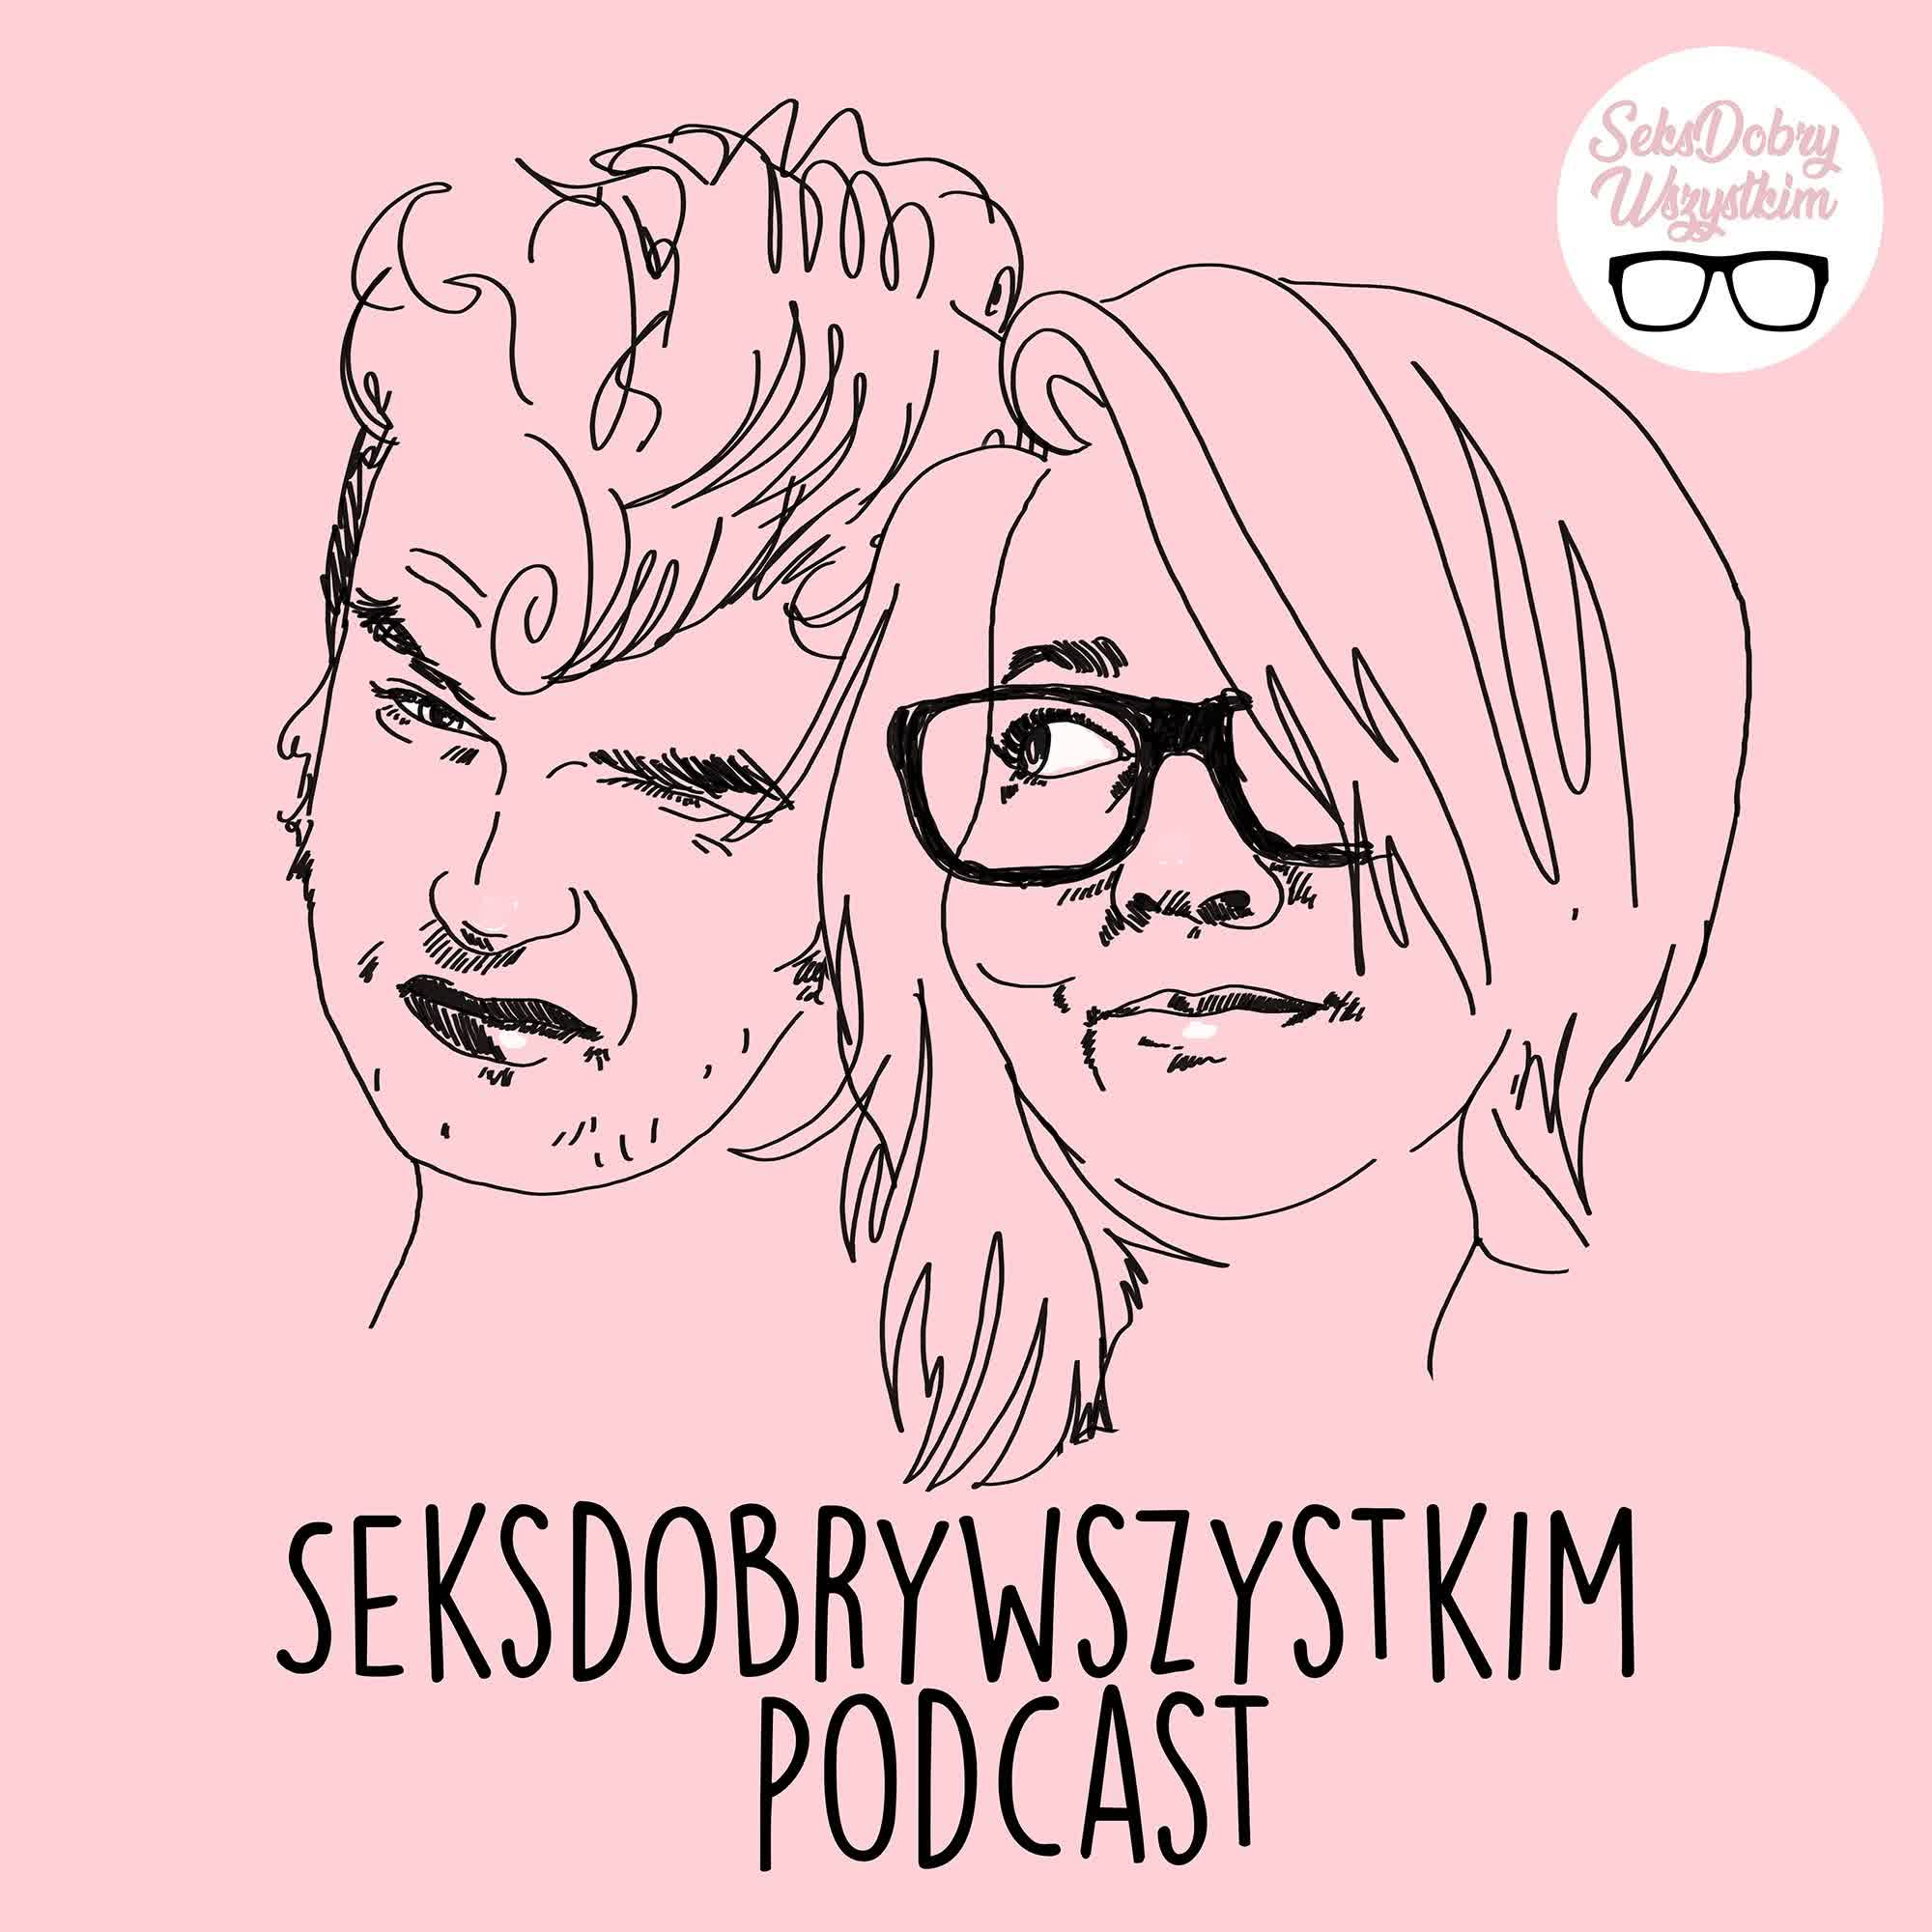 #34  Seksdobrywszystkim Polskie piosenki o seksie - S02E4